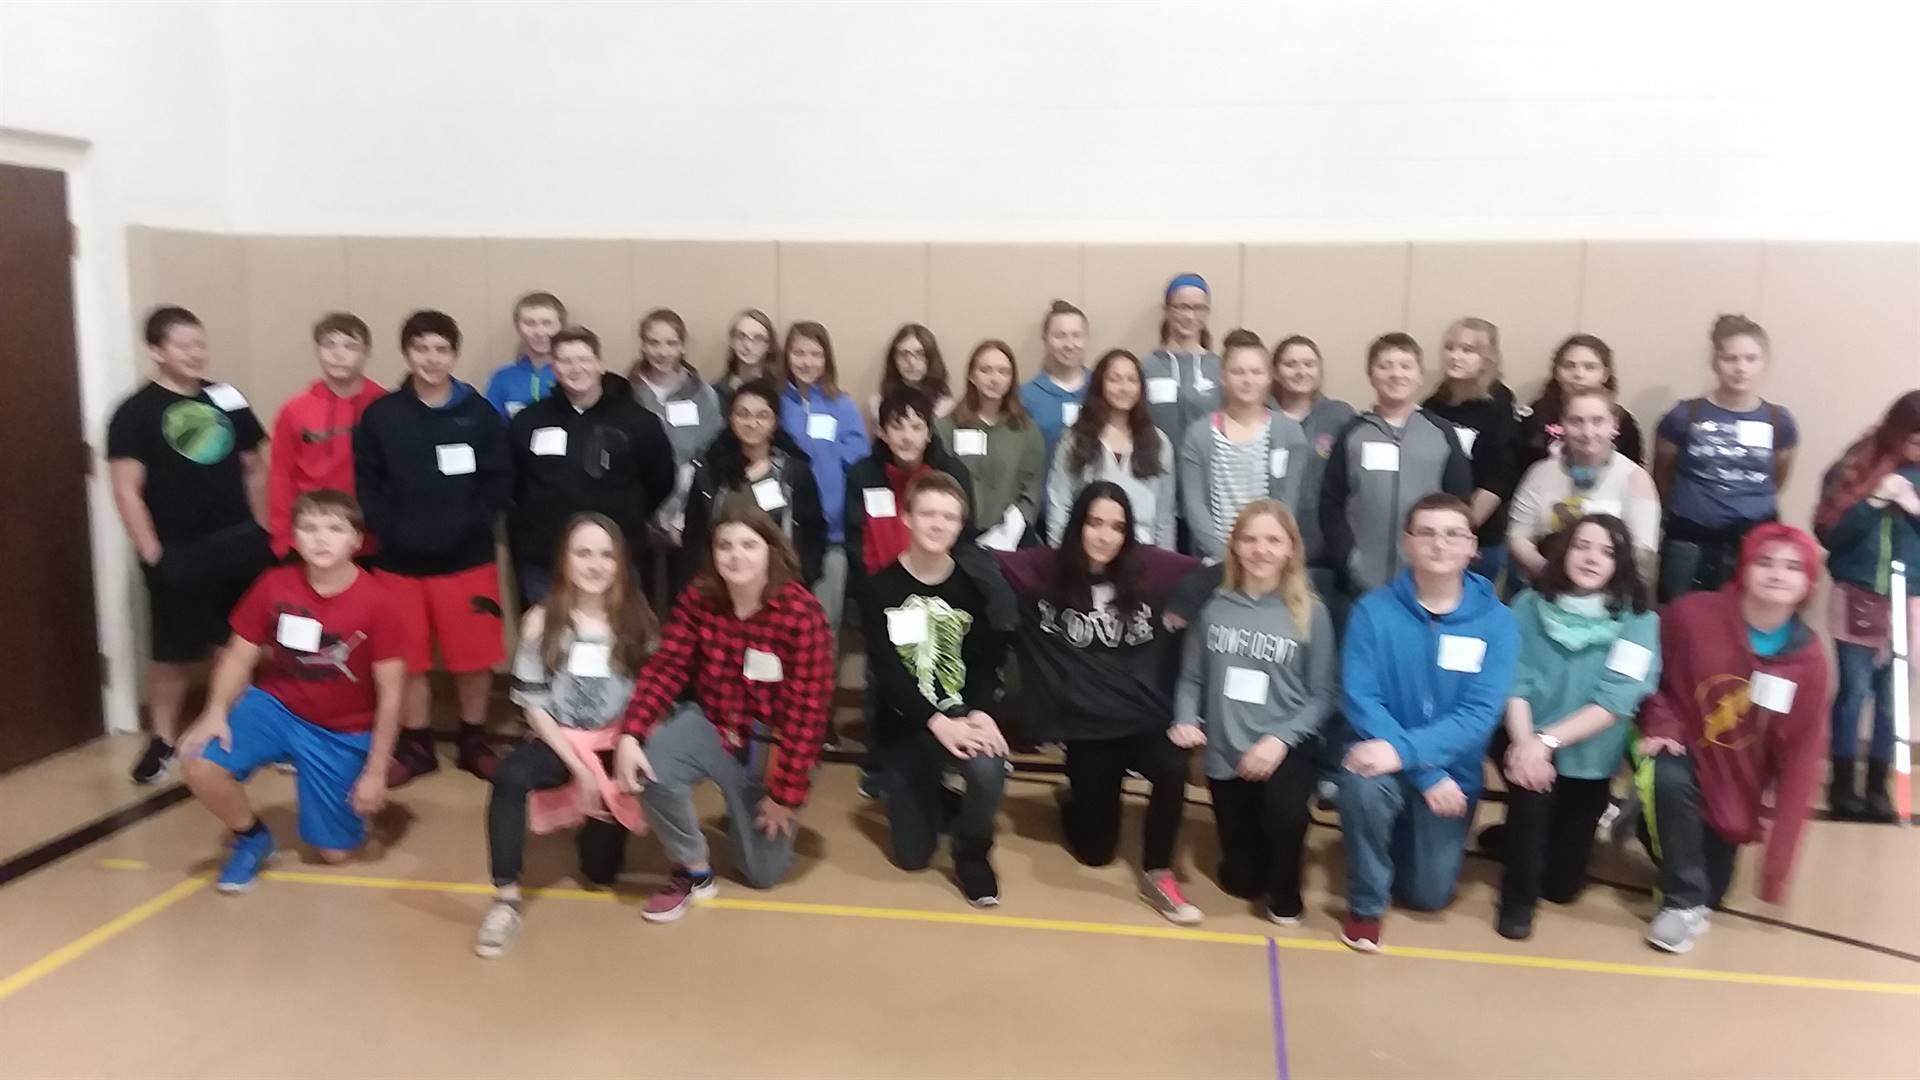 8th grade career fair at OAOC